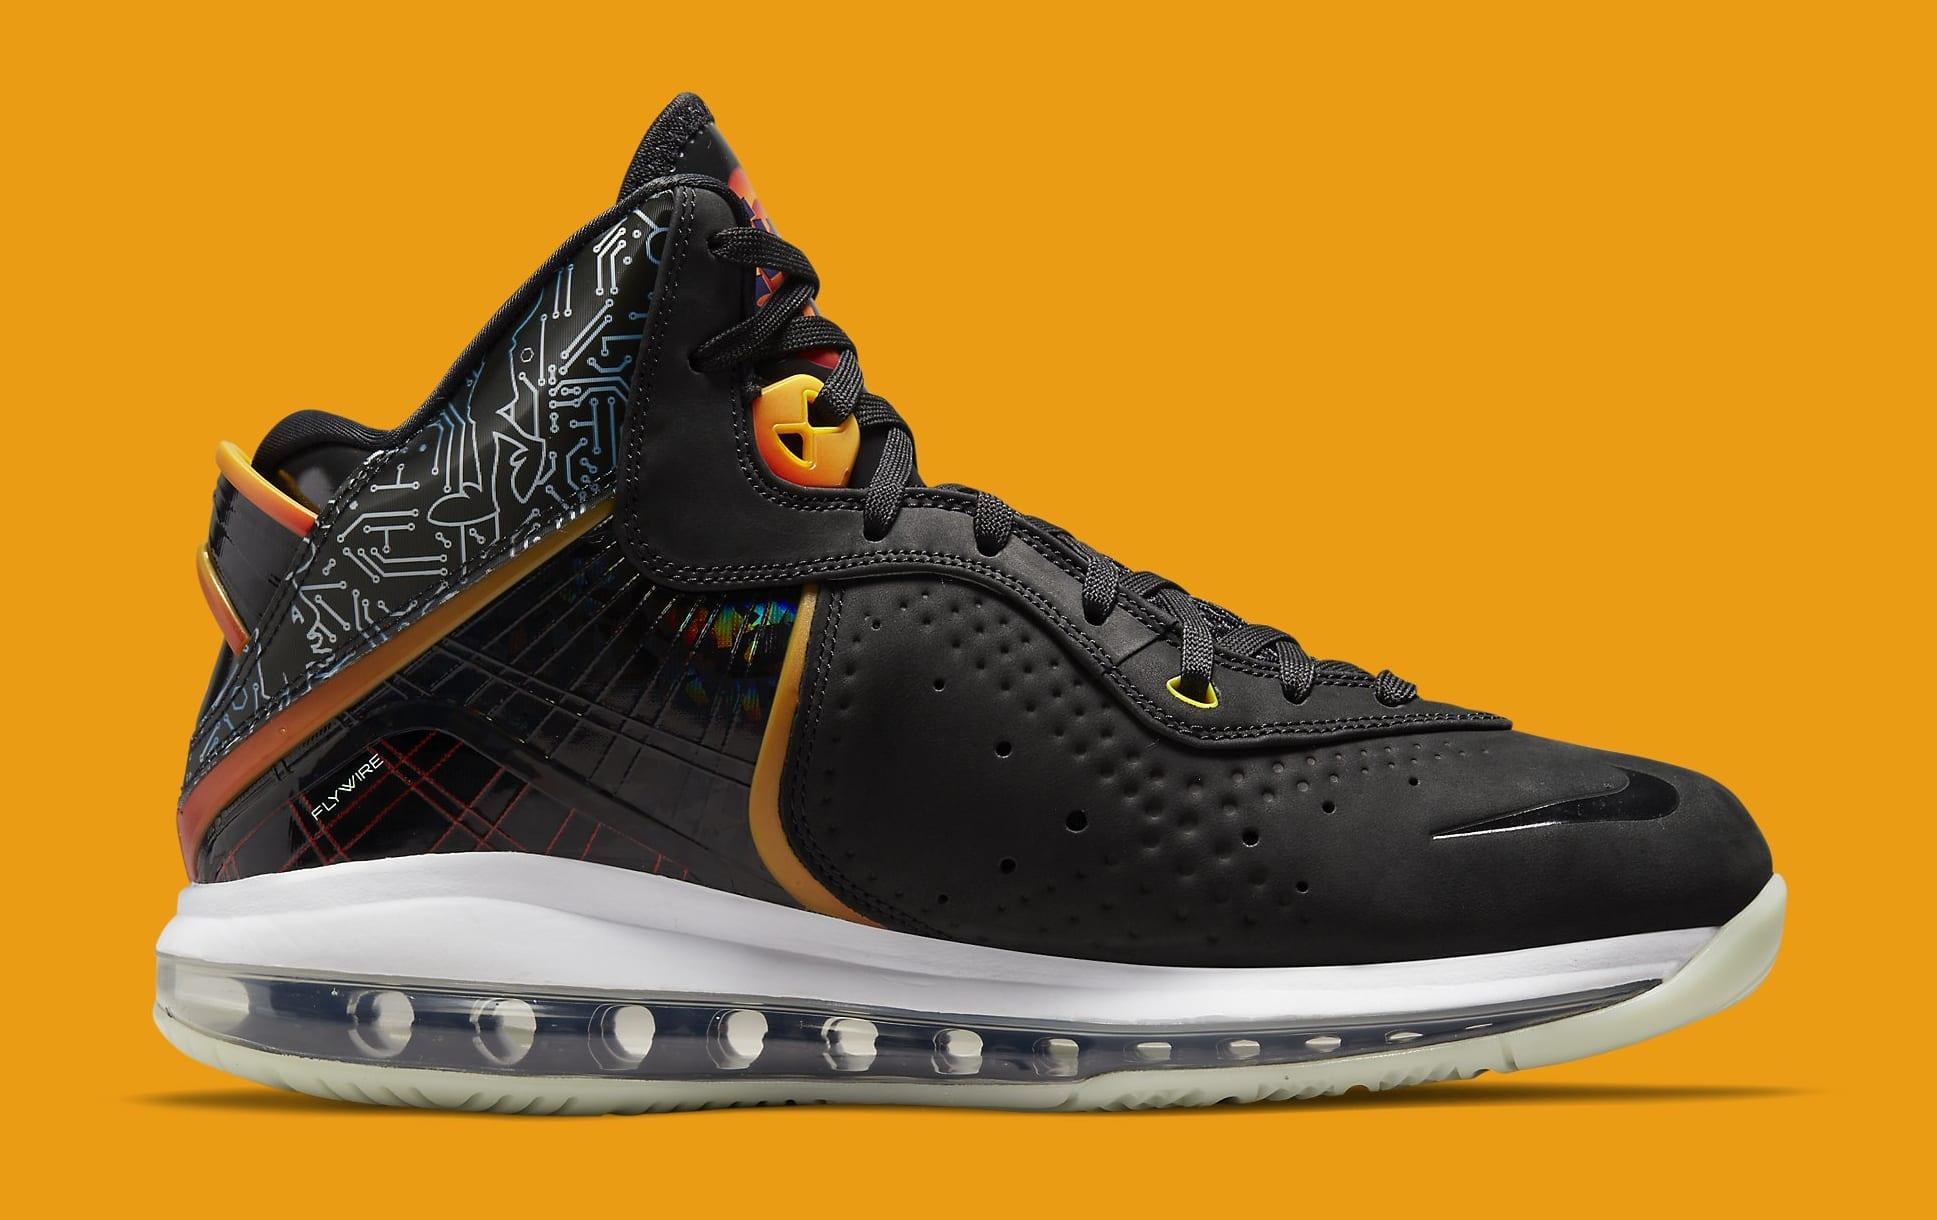 Nike LeBron 8 'Space Jam' DB1732-001 Medial